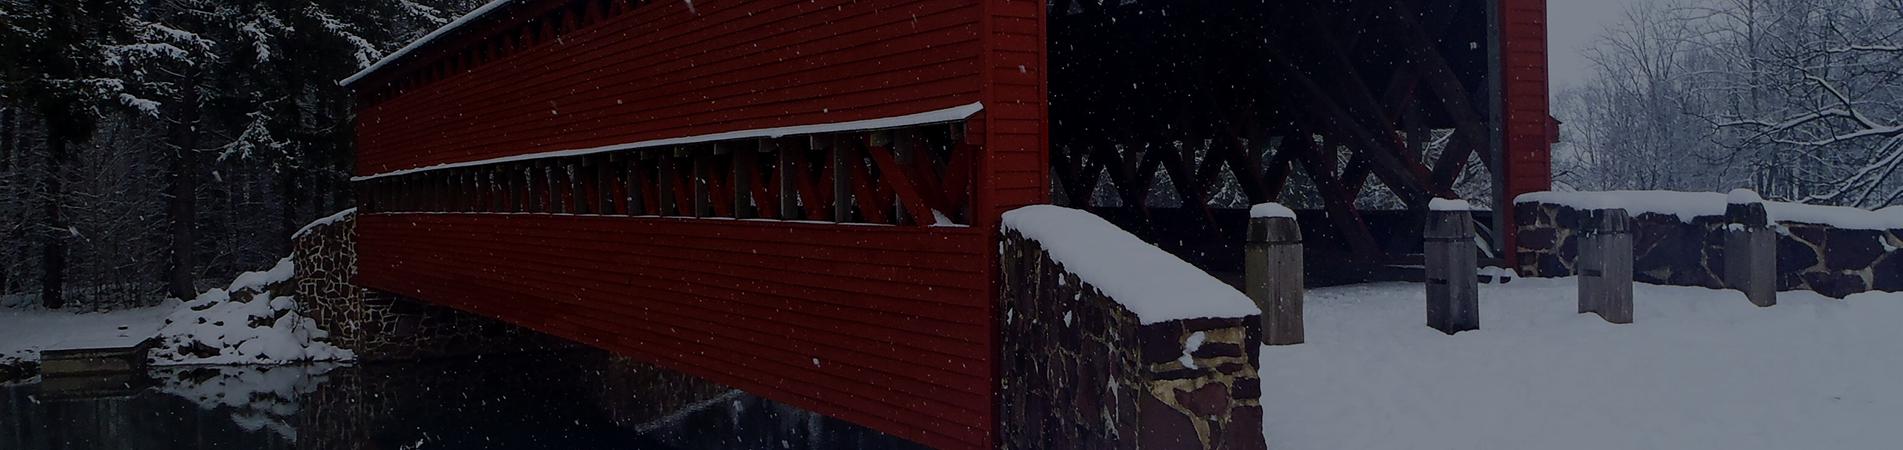 pennsylvania-banner